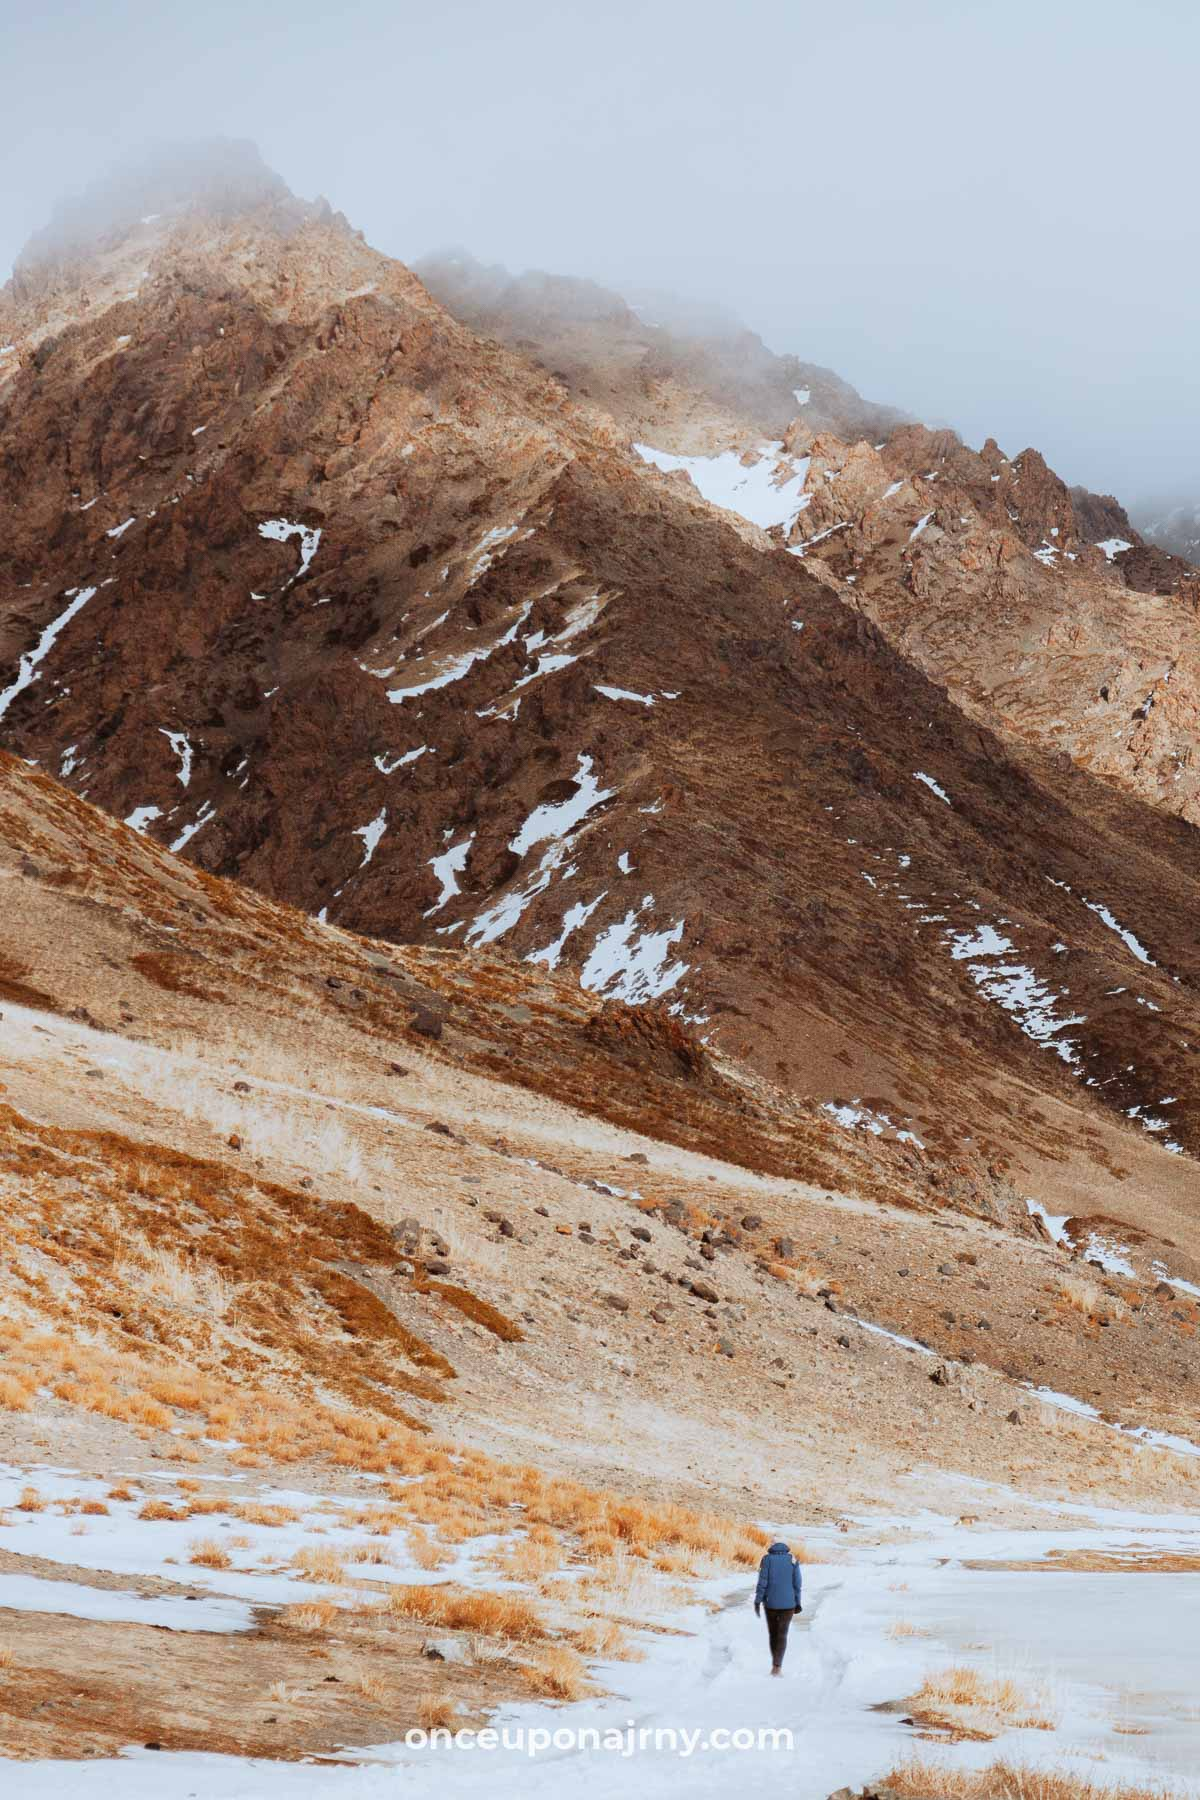 Yolin Am Canyon Gorge in Gurvan Saikhan Mountains Mongolia hike